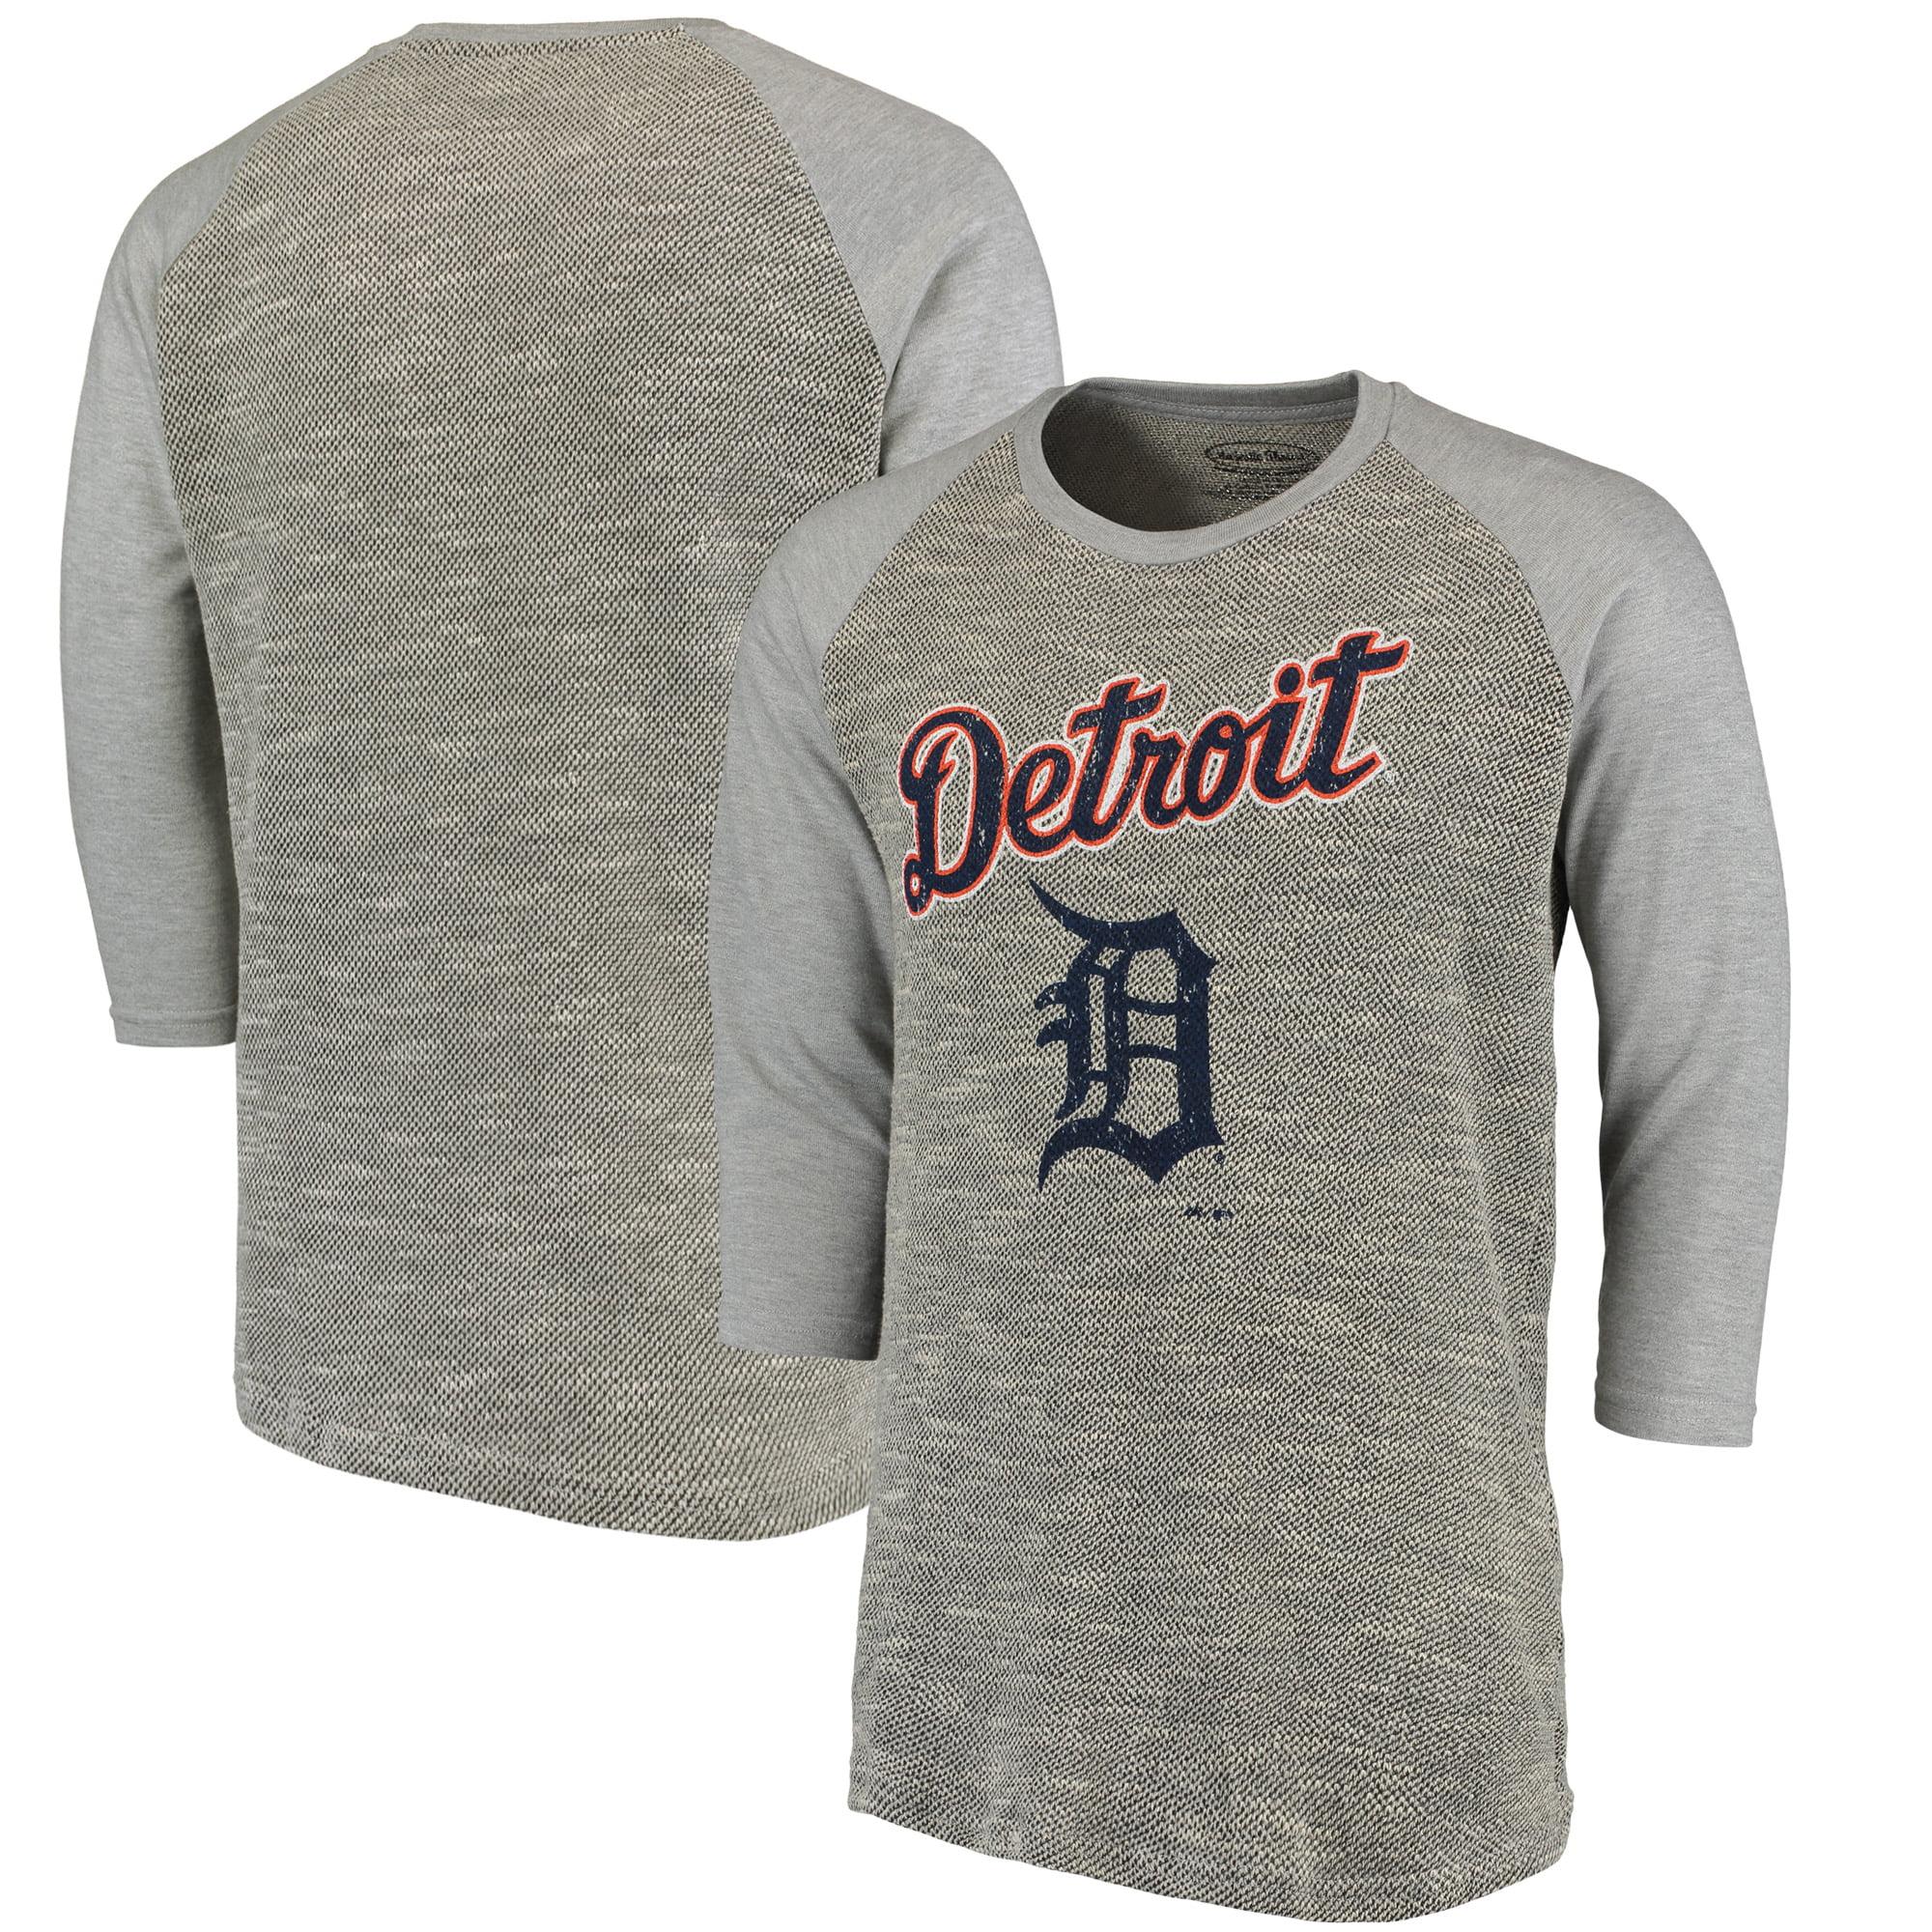 Detroit Tigers Majestic Threads Tri-Yarn French Terry 3/4-Sleeve Raglan T-Shirt - Gray